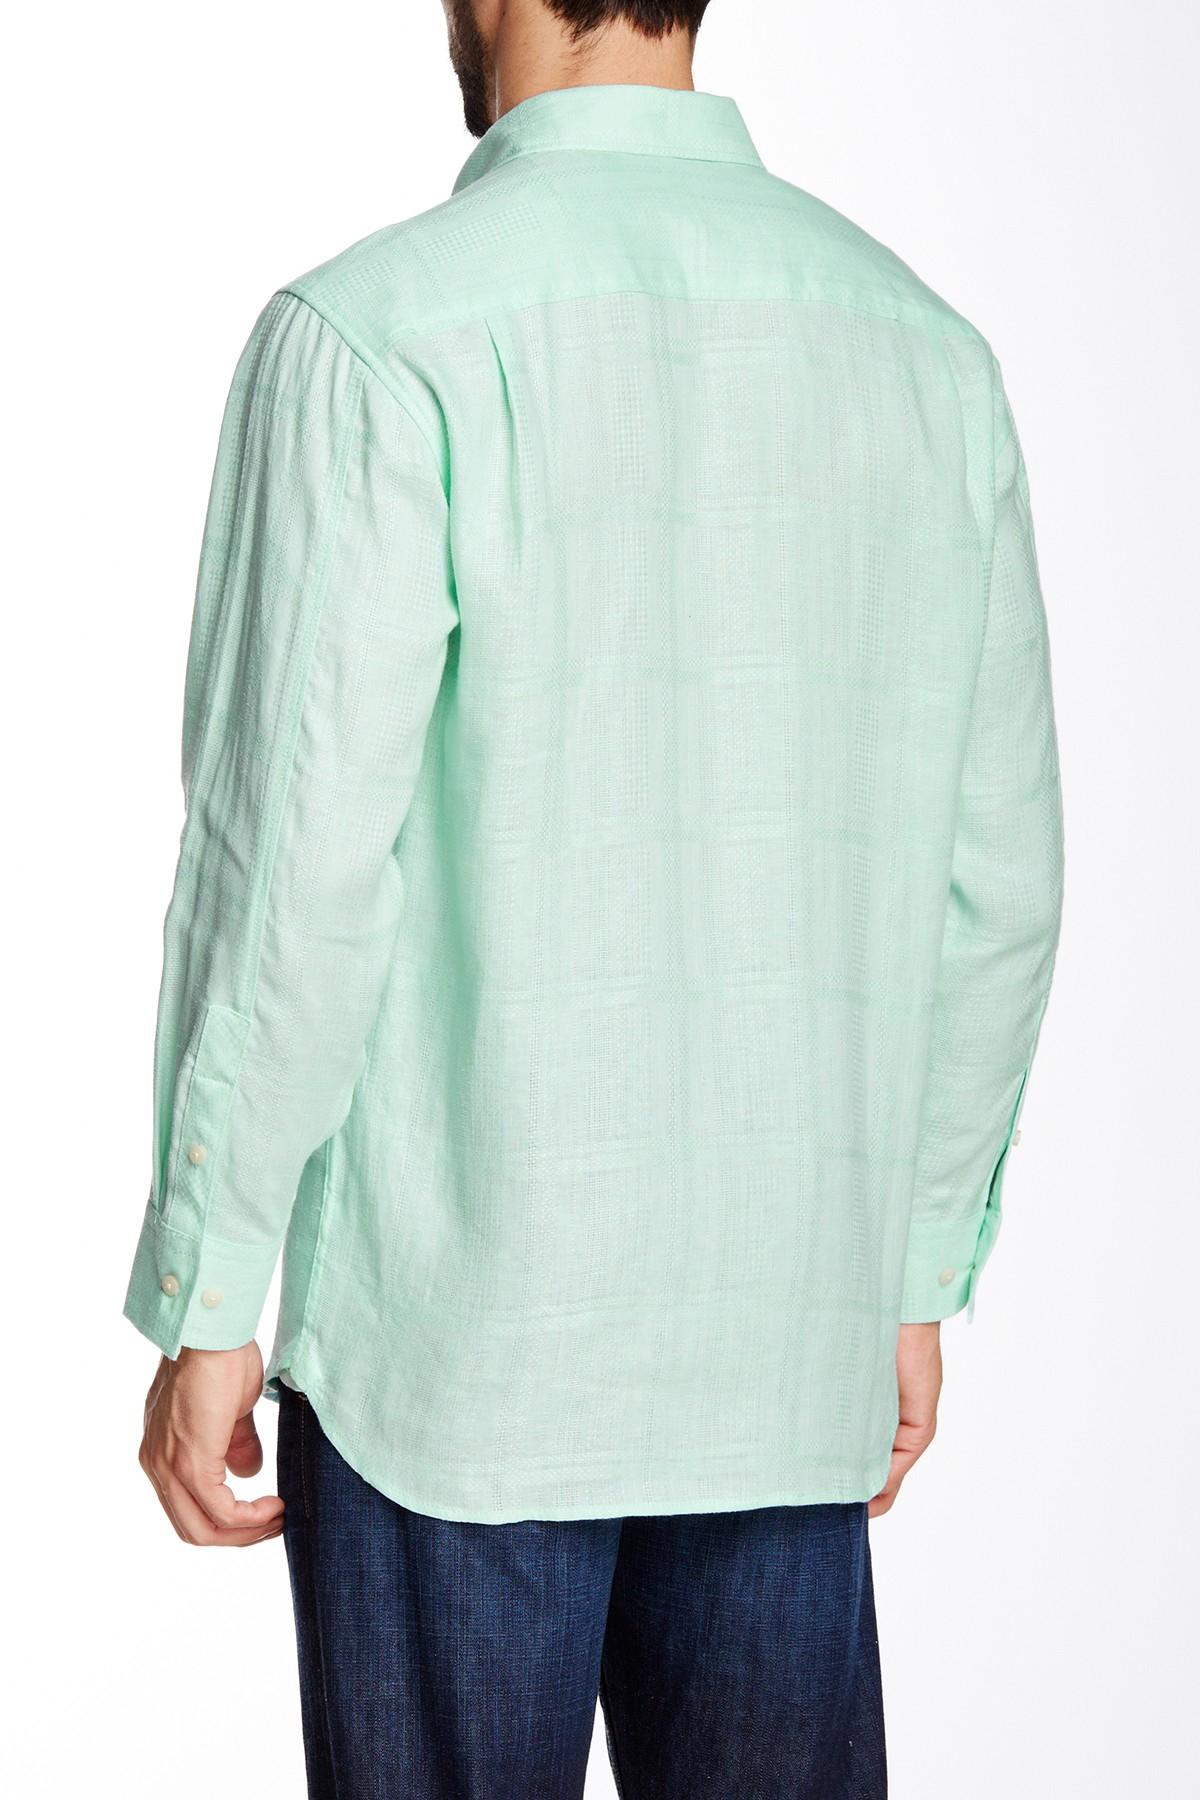 Lyst tommy bahama tropez long sleeve regular shirt in for Tommy bahama long sleeve dress shirts